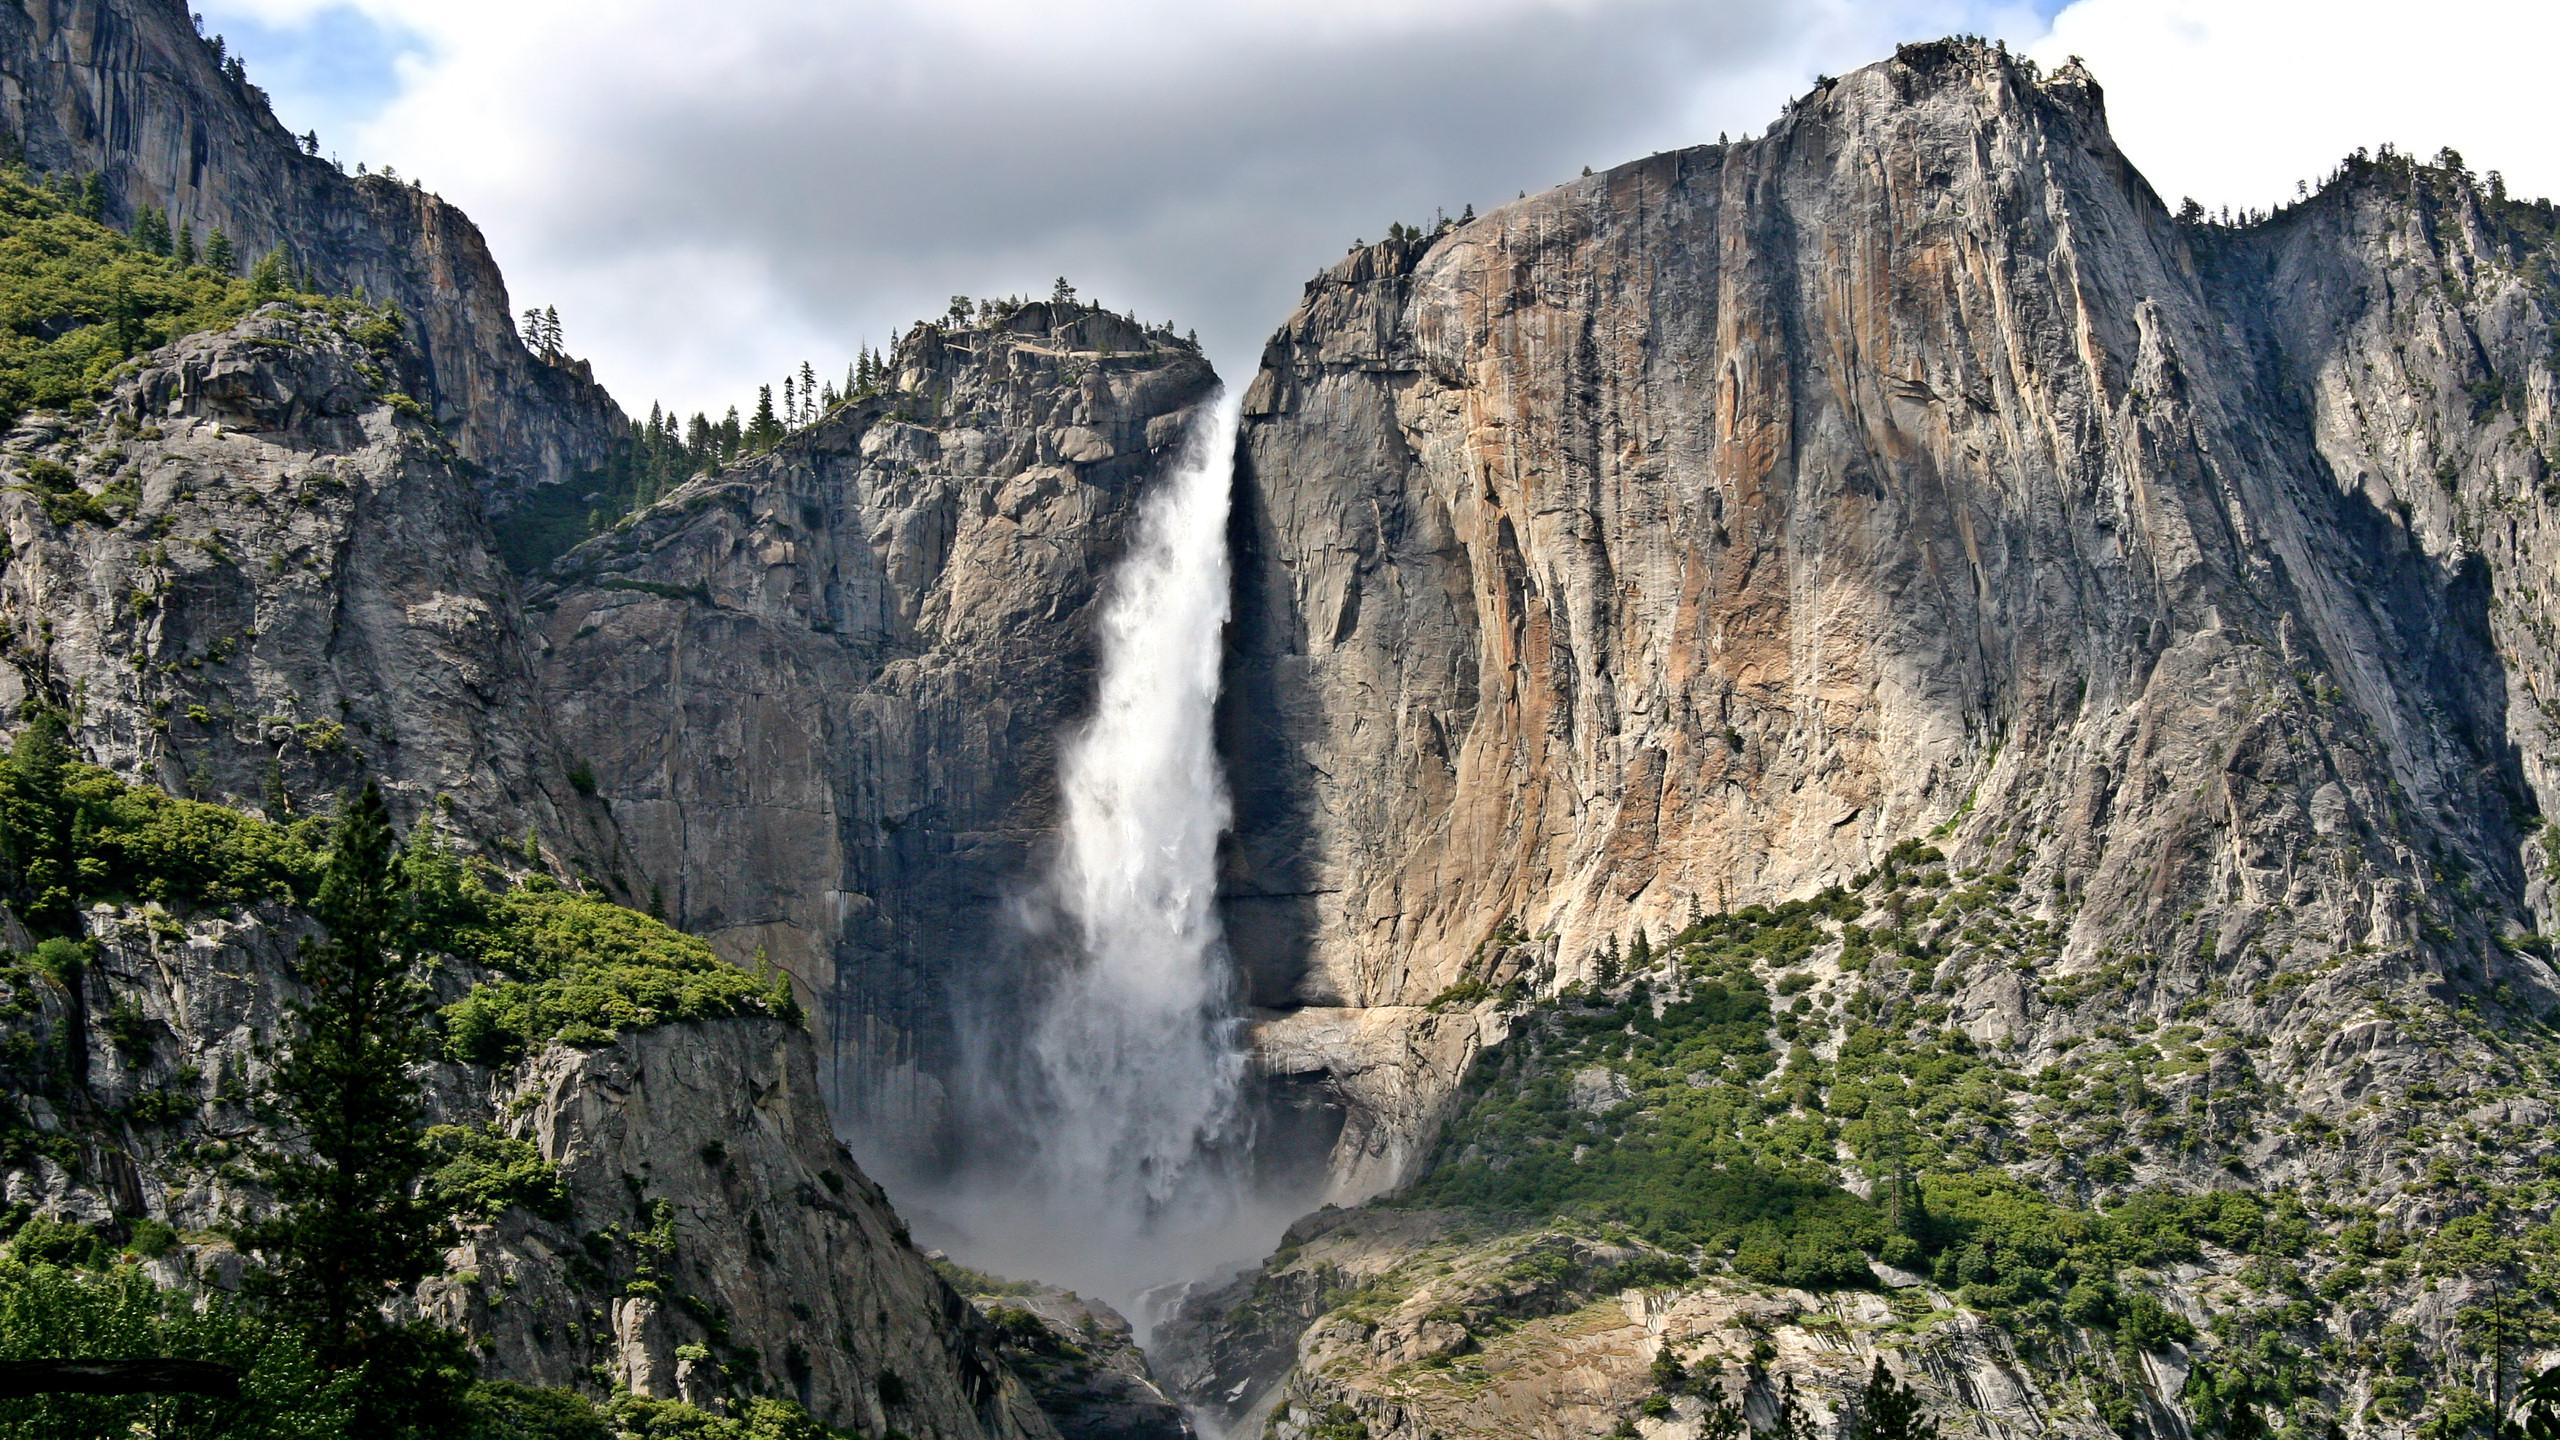 Hd wallpaper yosemite - Upper Yosemite Falls